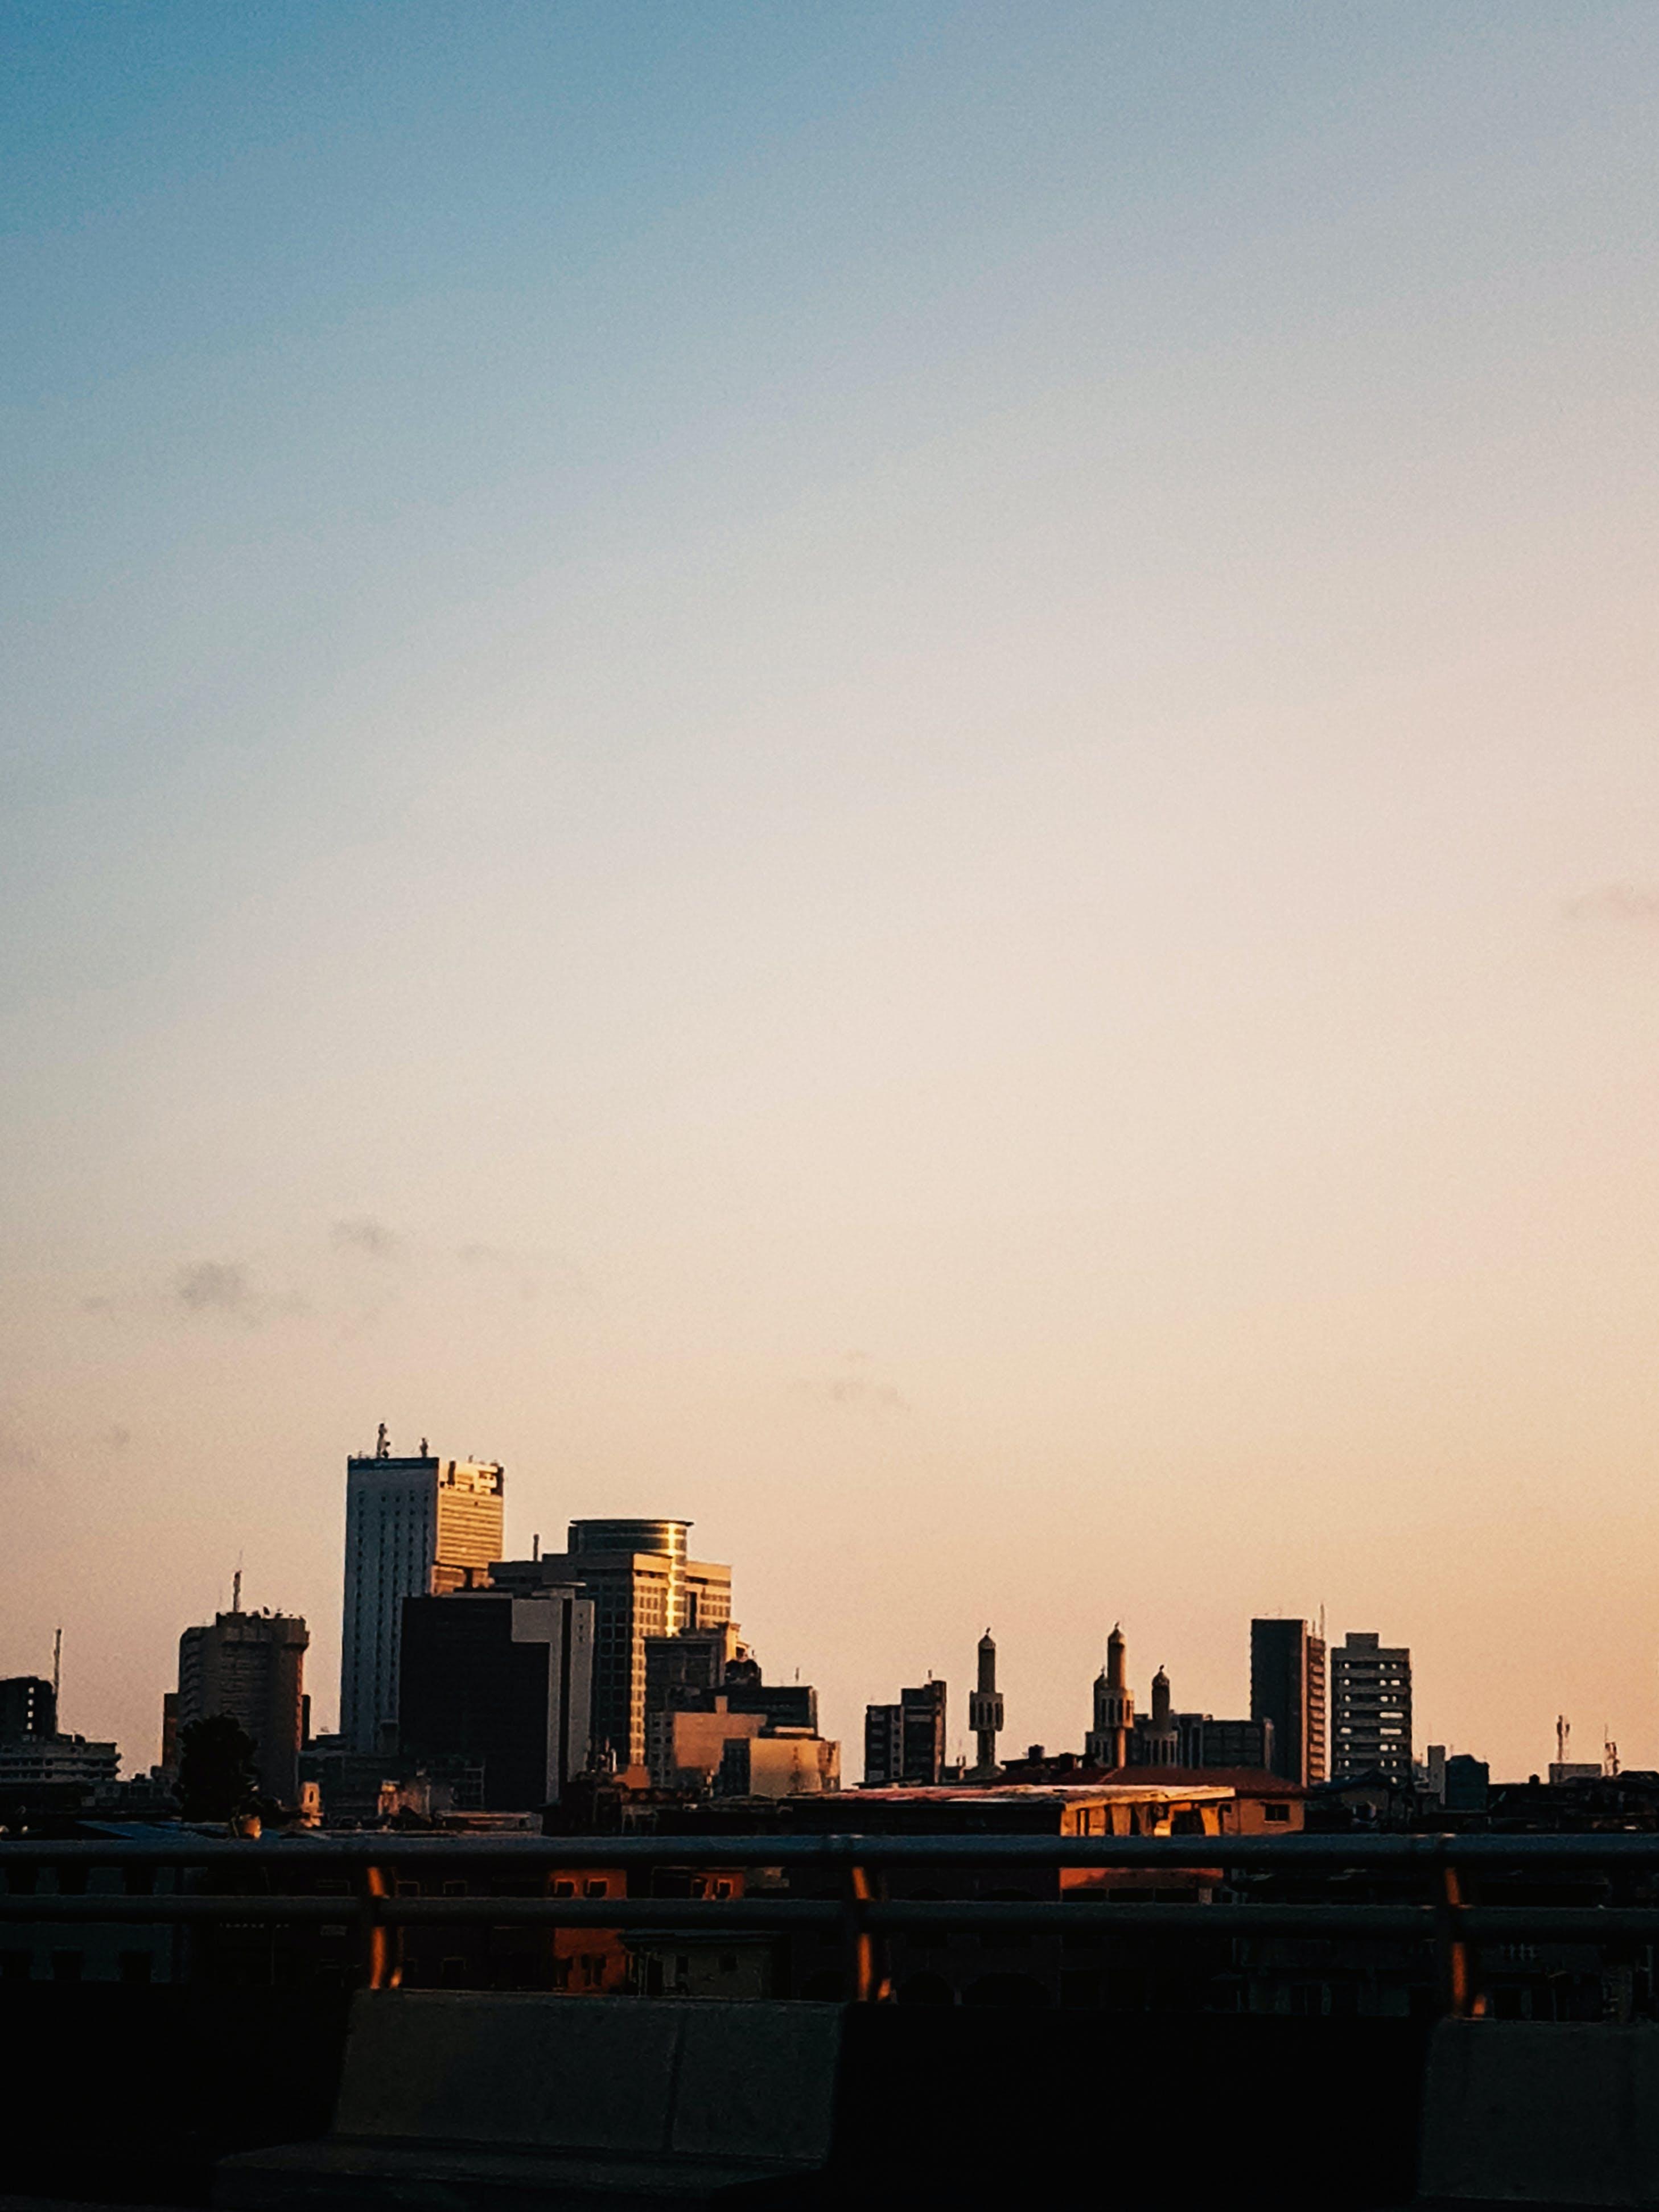 Free stock photo of city, city scape, city view, minimalism